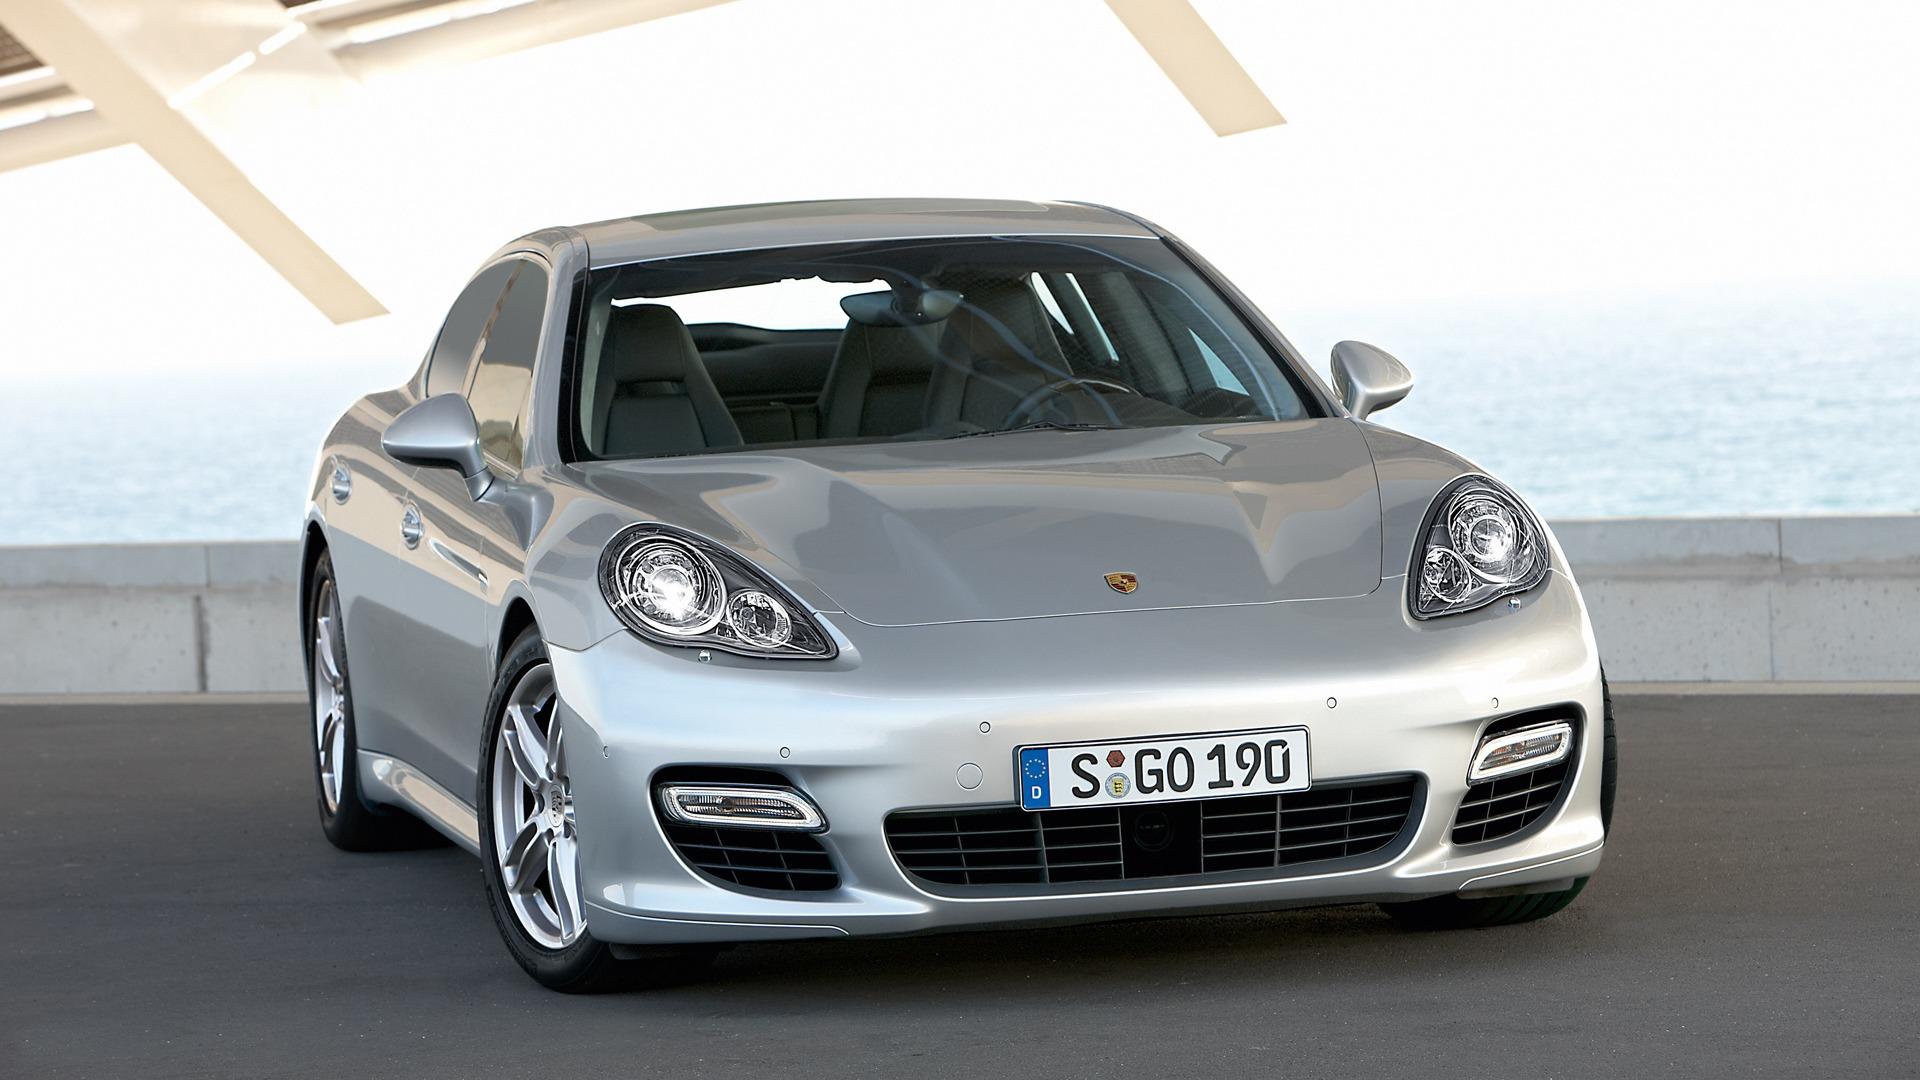 Porsche Panamera Turbo - 2009 fonds d'écran HD #34 - 1920x1080 Fond d ...